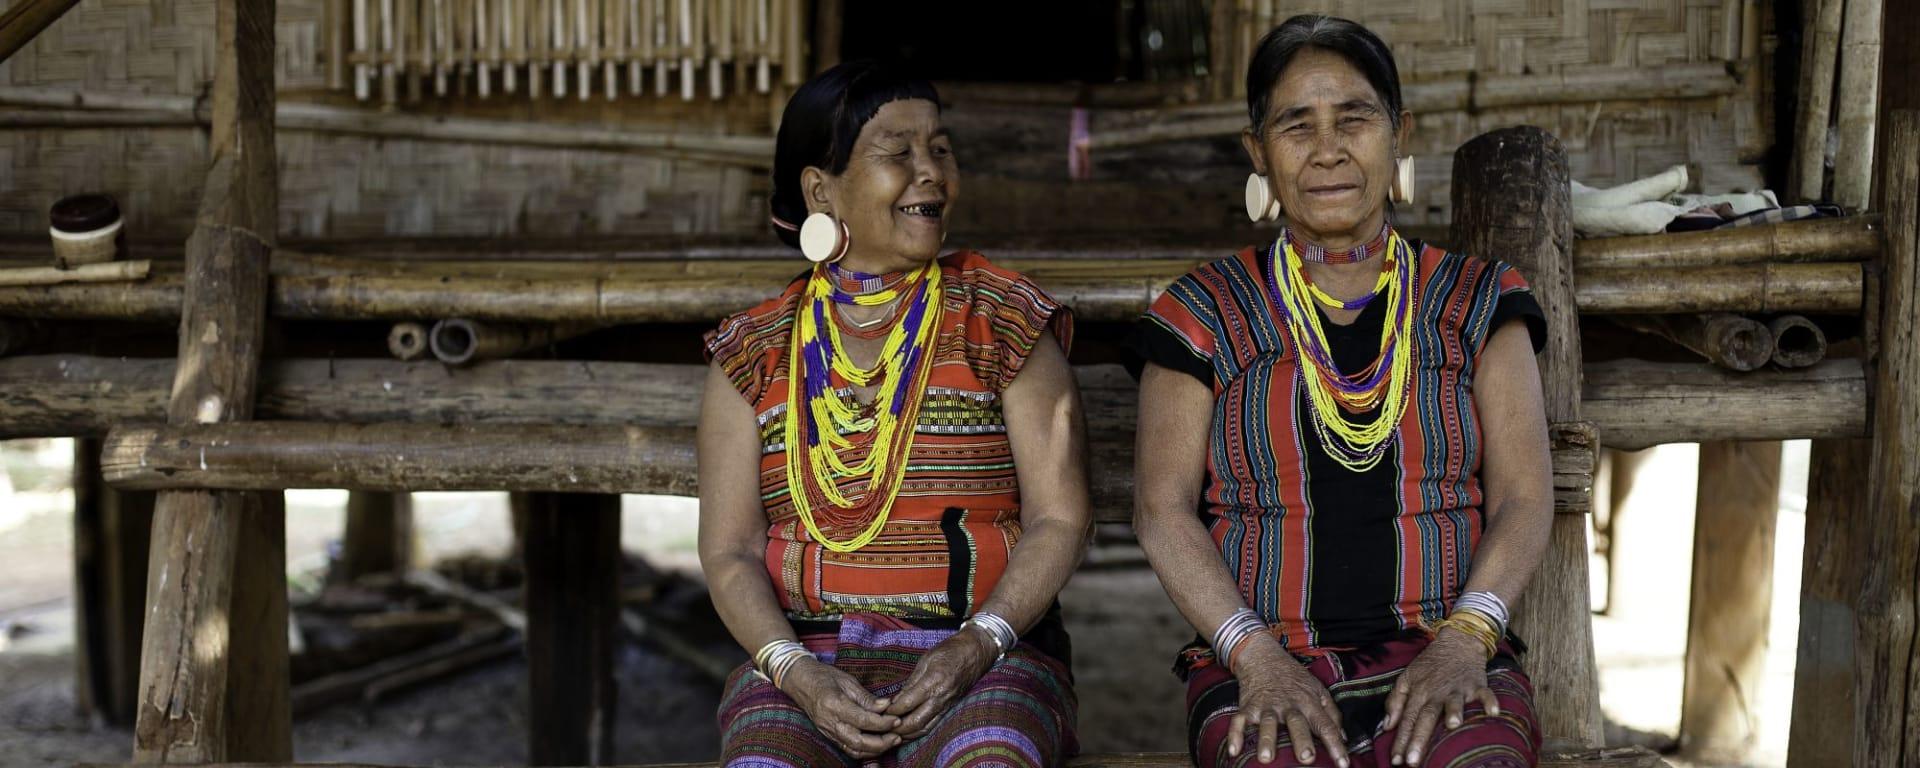 Le nord fascinant du Laos de Luang Prabang: Hilltribe Women